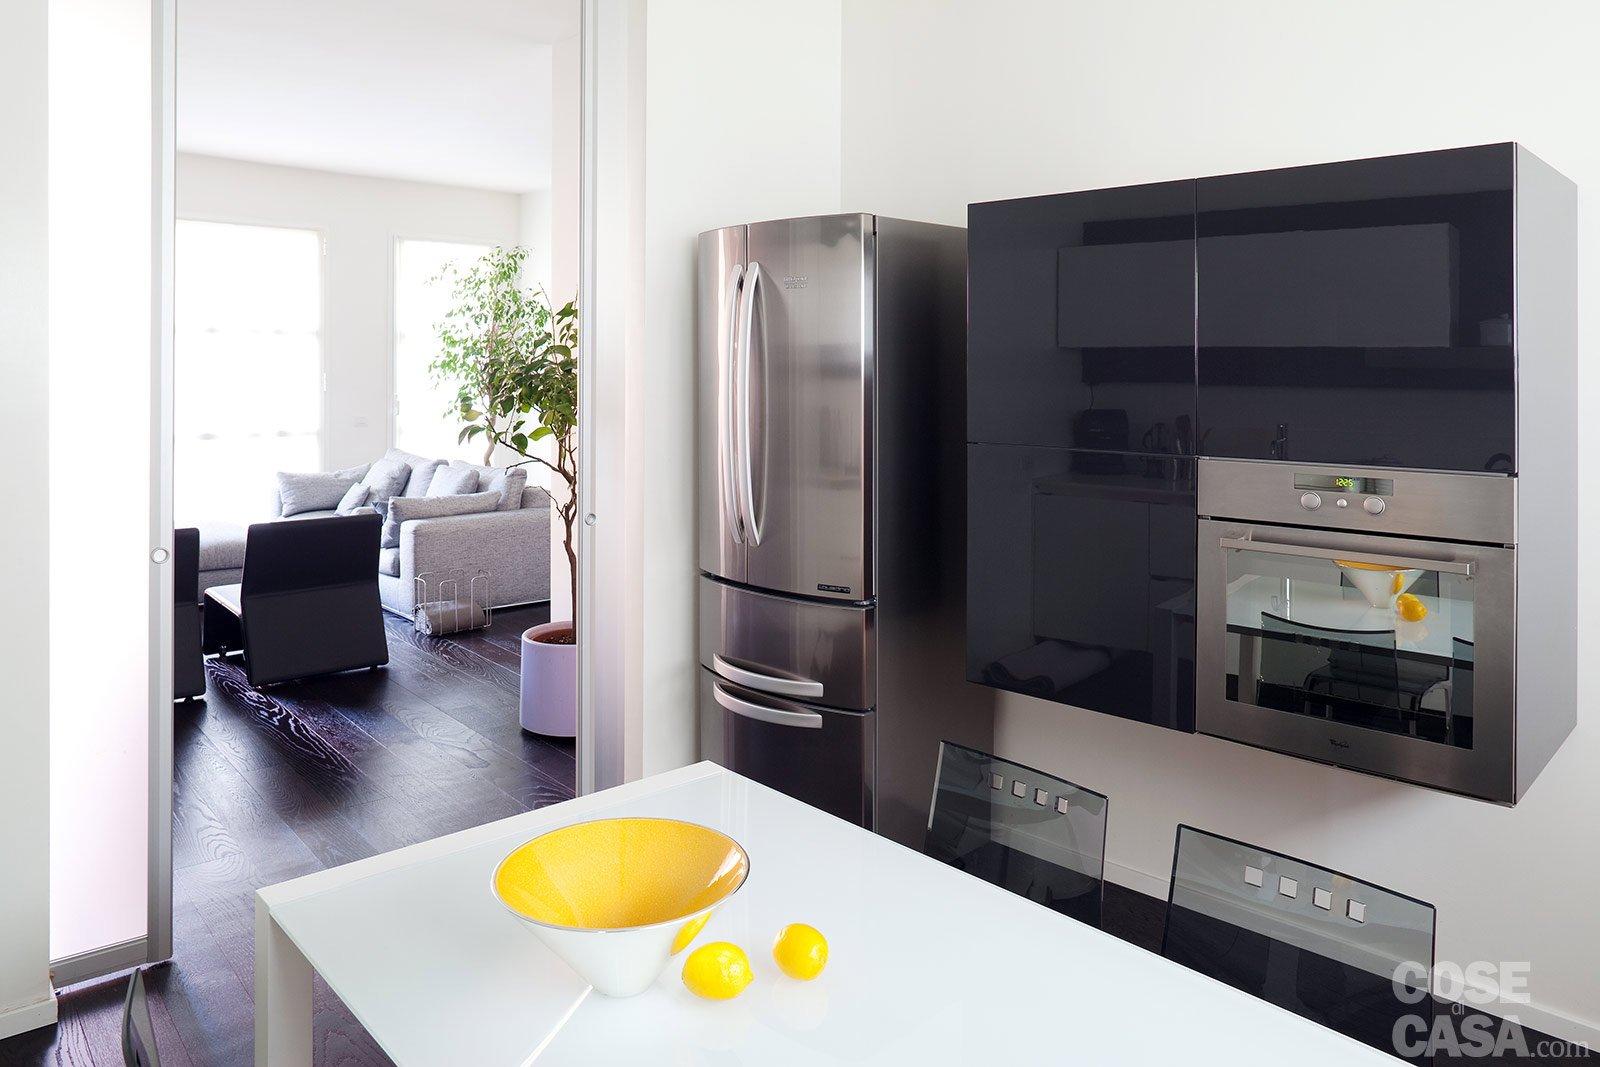 Una casa ristrutturata puntando sull 39 efficienza energetica - Cucine con frigo esterno ...